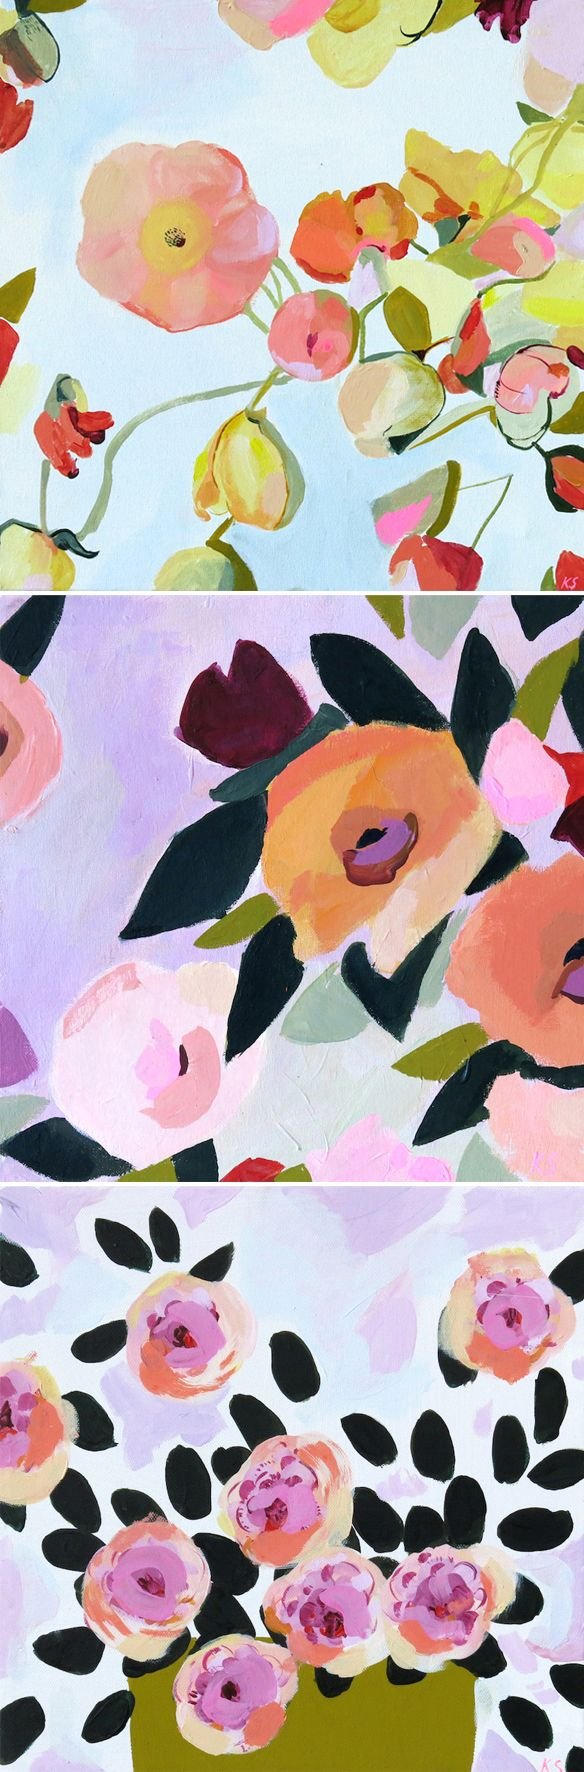 KATYSMAIL_flowers